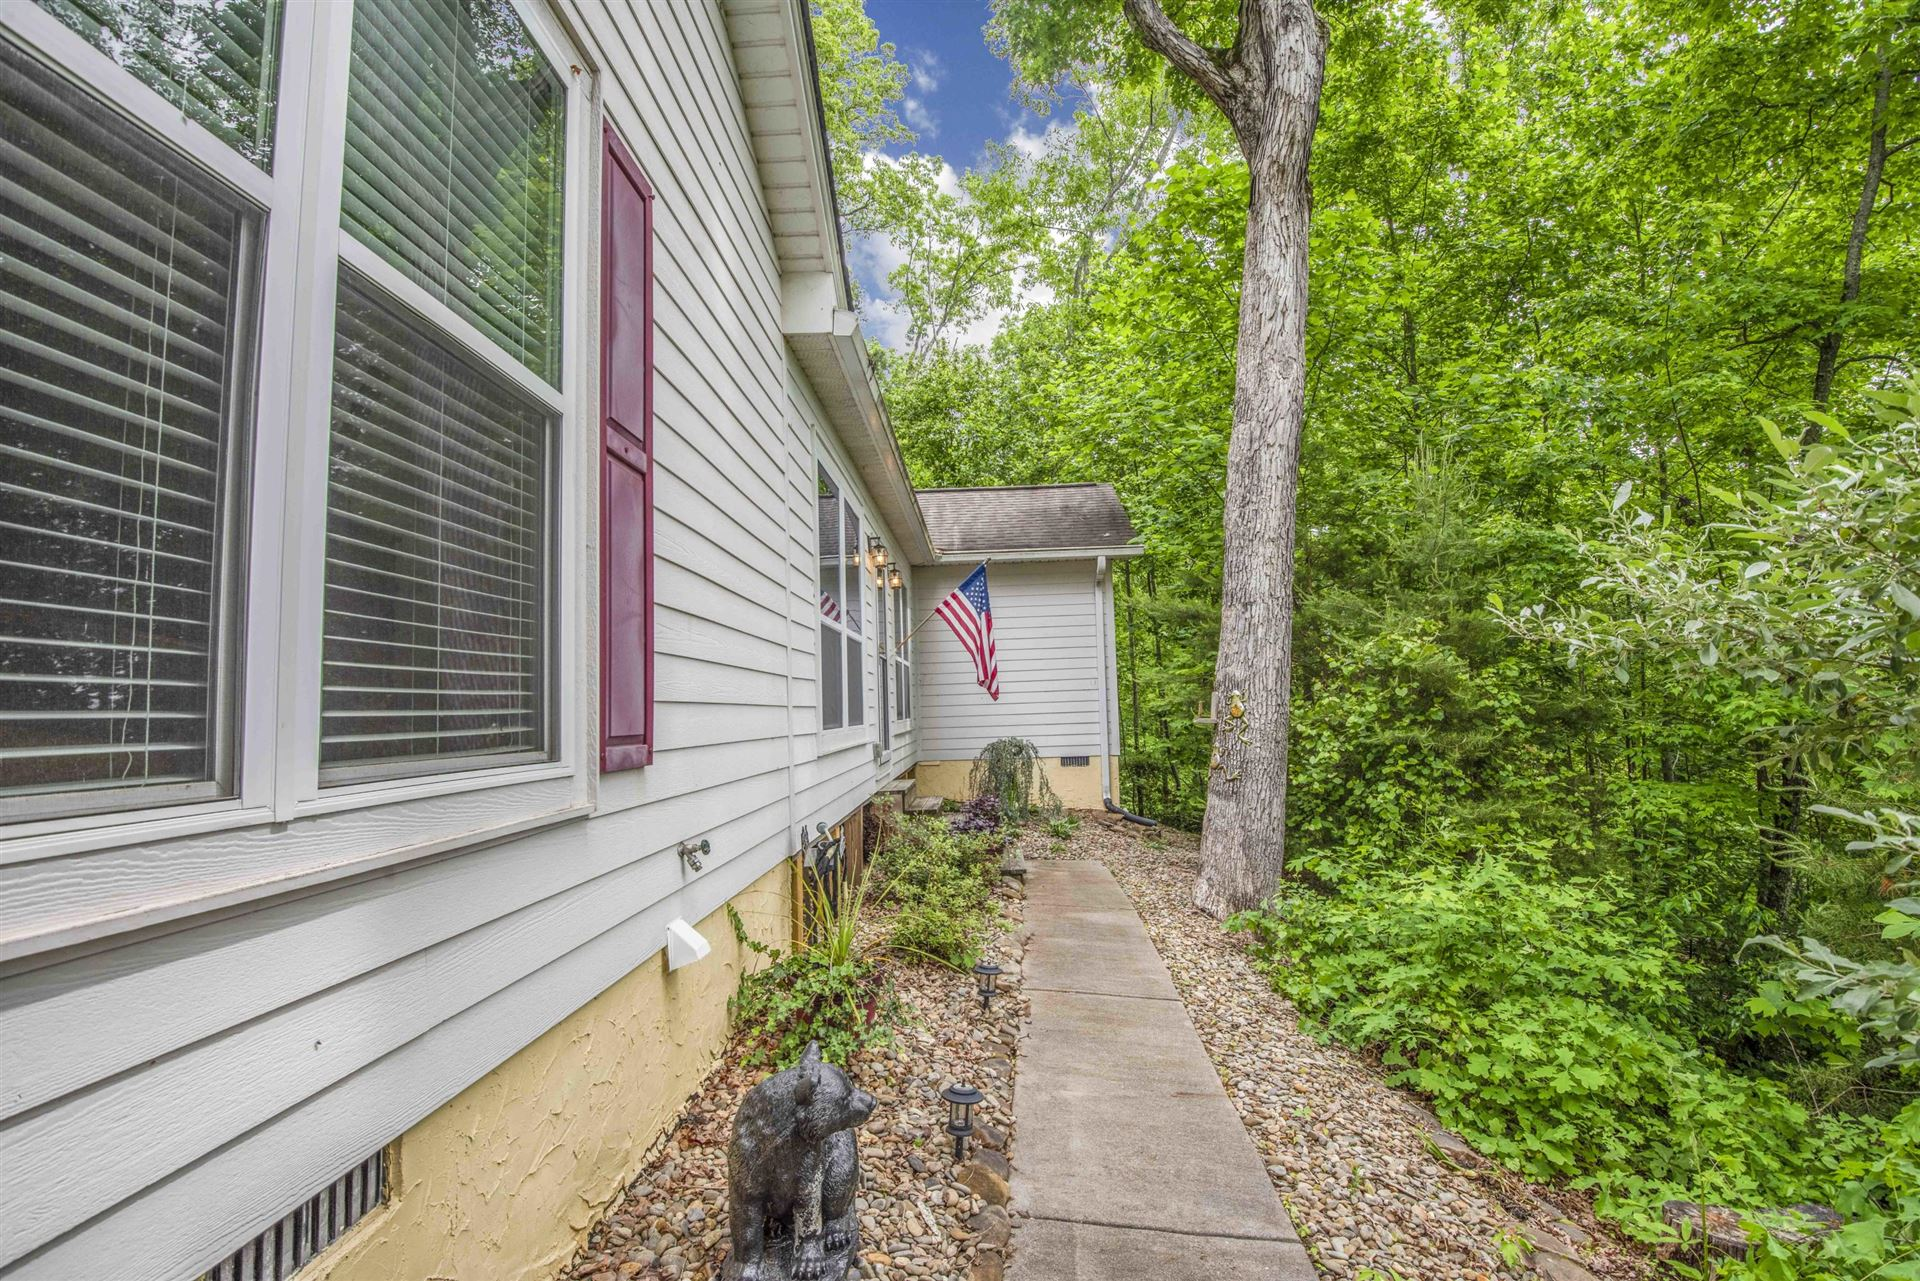 Photo of 811 Mountain Grove Lane, Seymour, TN 37865 (MLS # 1152498)